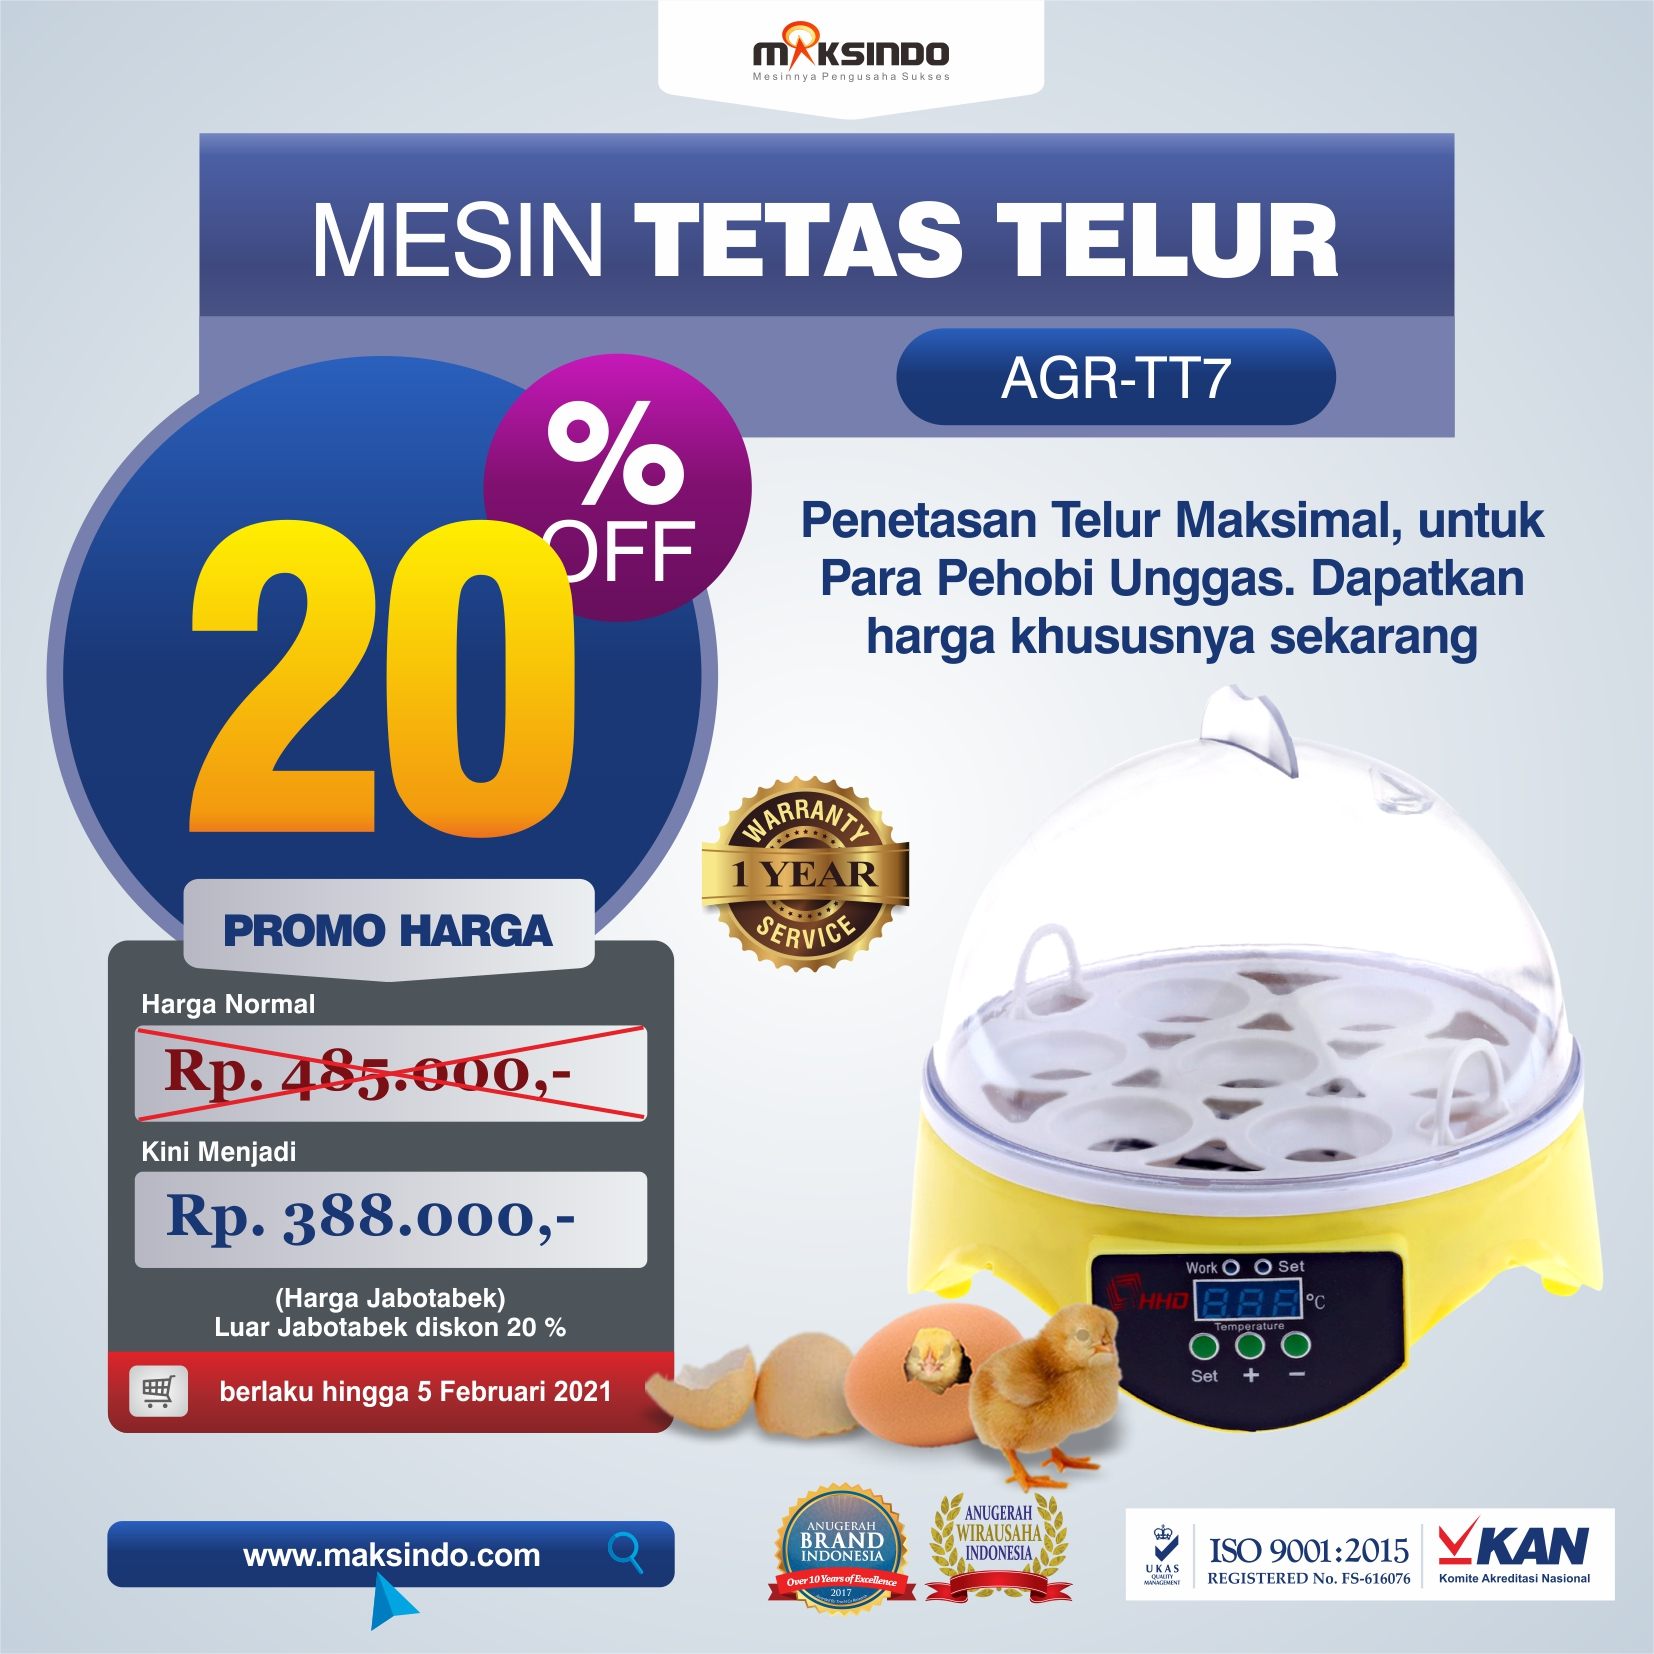 Jual Mesin Penetas Telur 7 Butir di Yogyakarta